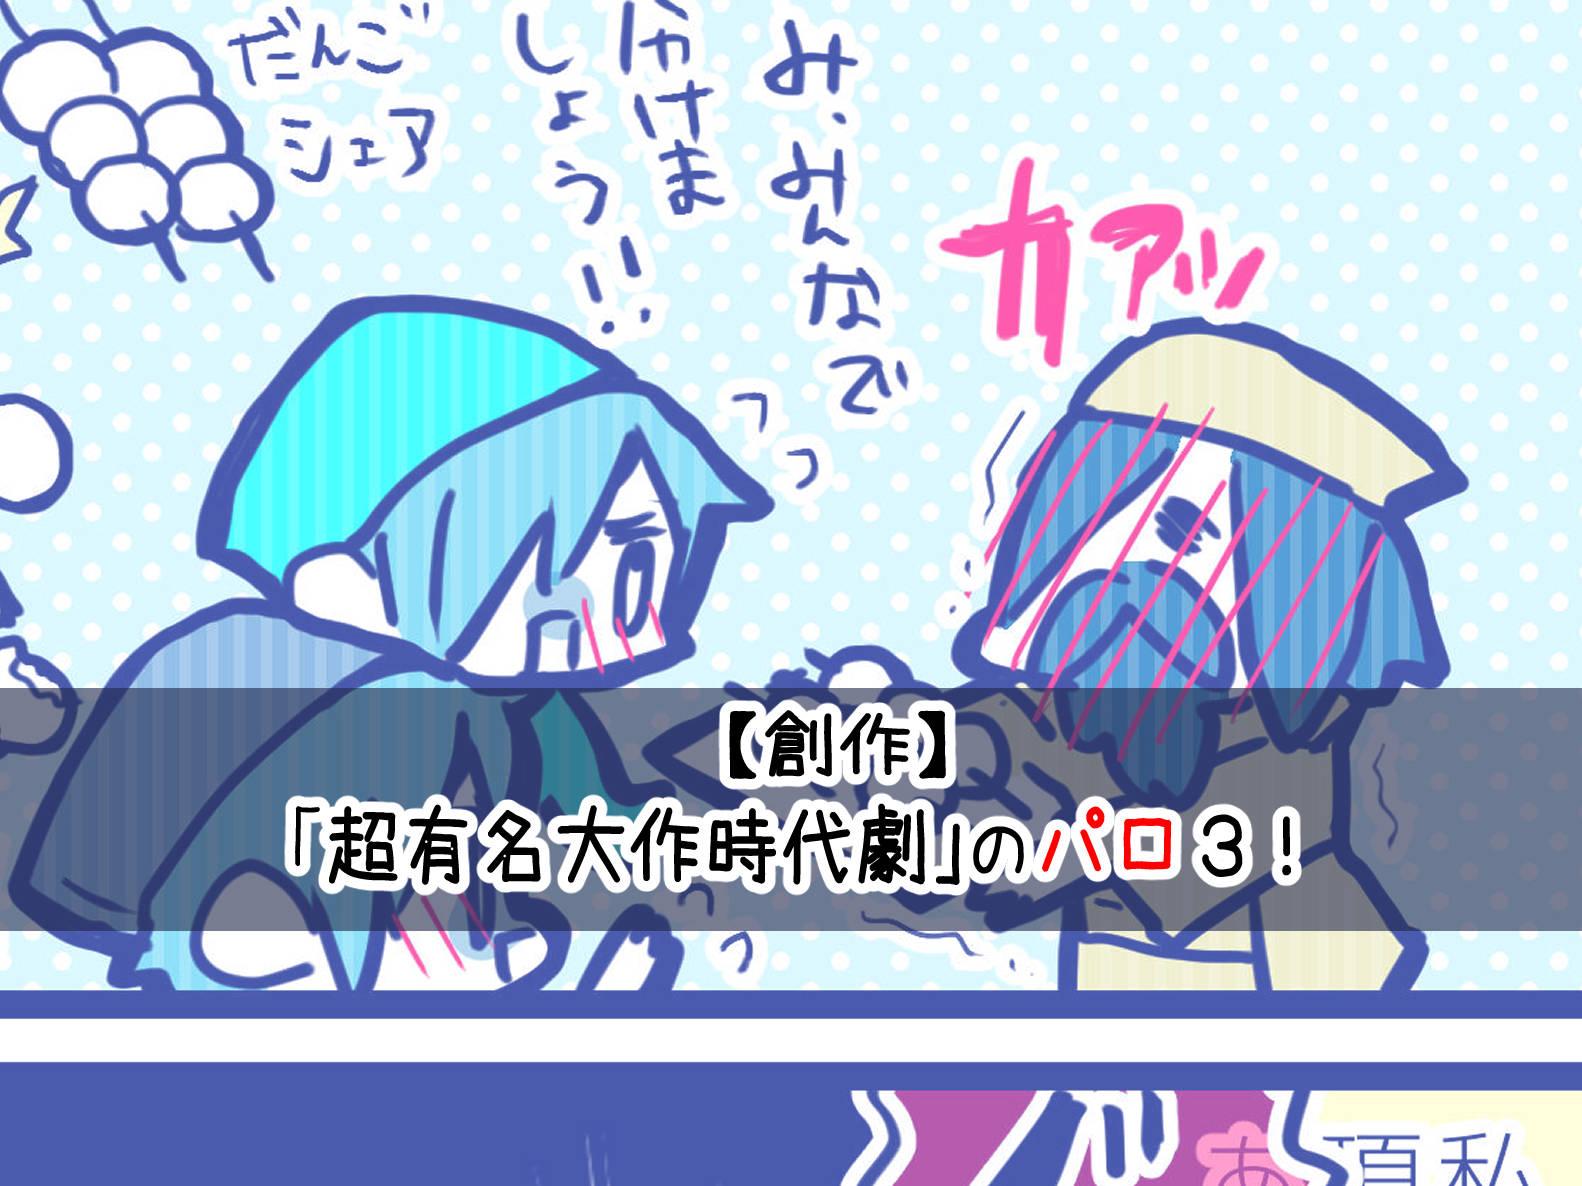 neetsadami.com_19話サムネ